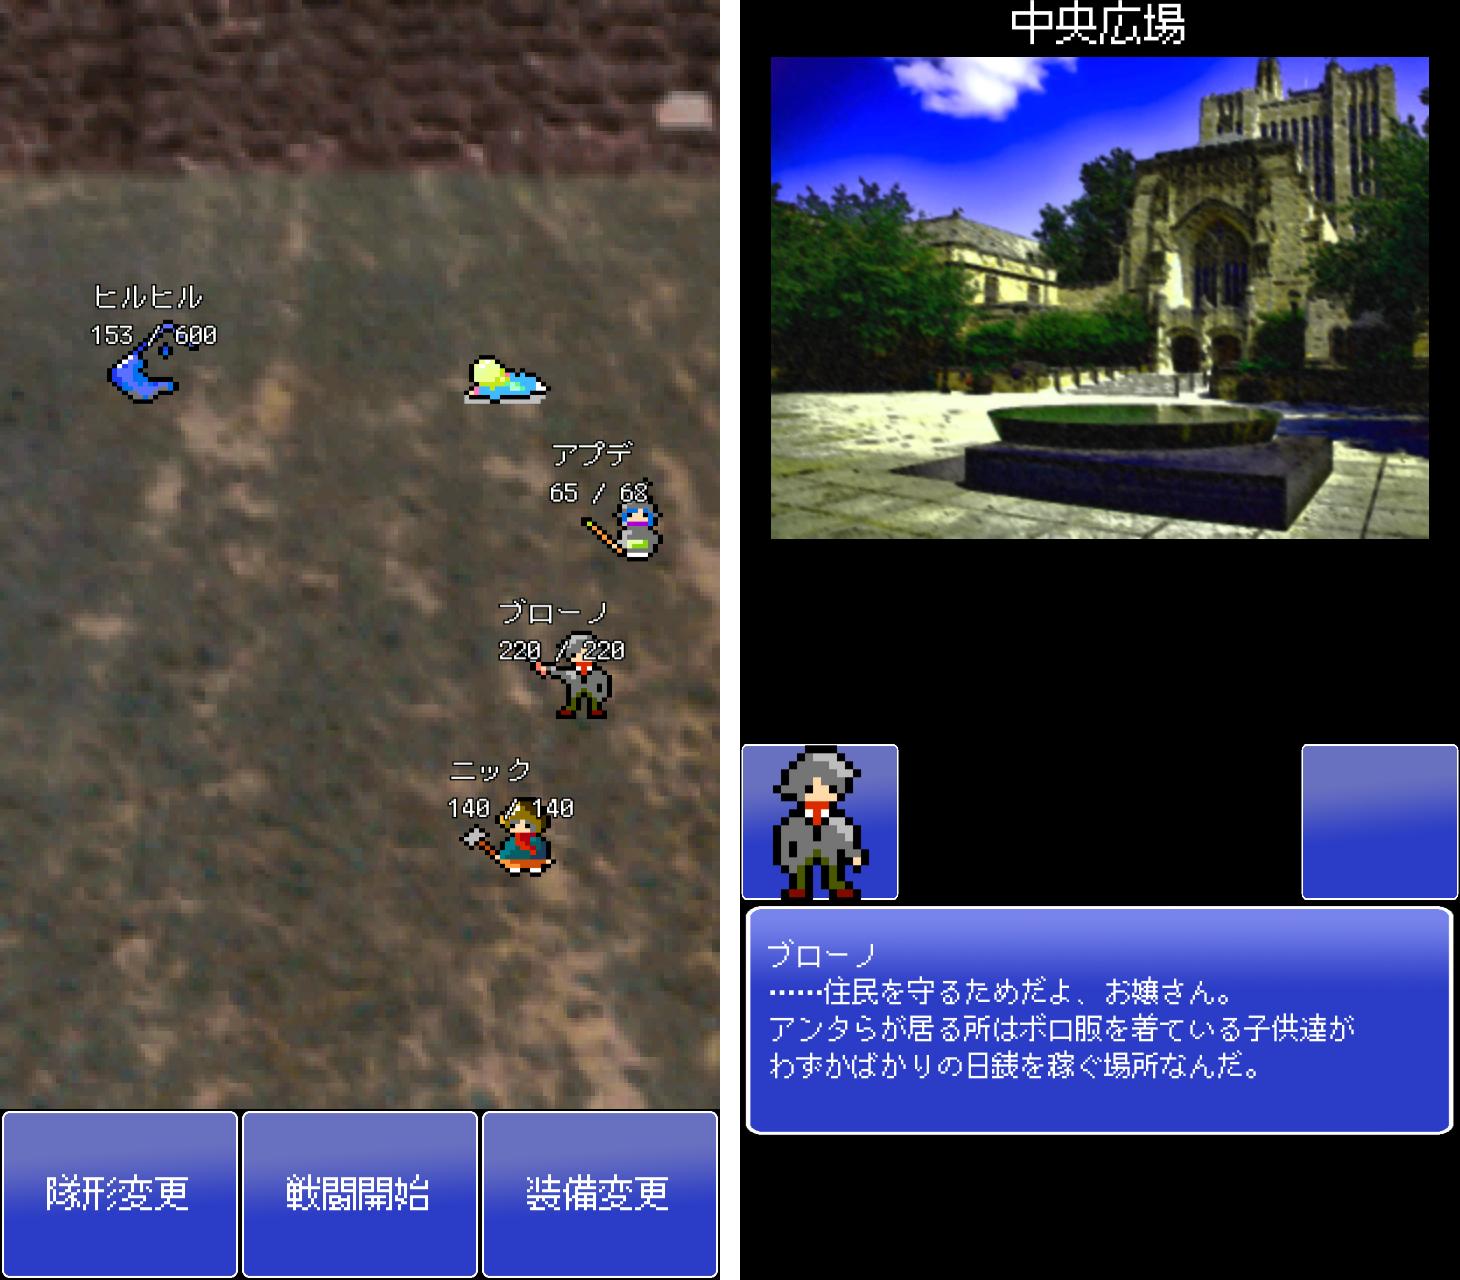 RebuildingSaga(リビルディング サ・ガ) androidアプリスクリーンショット1